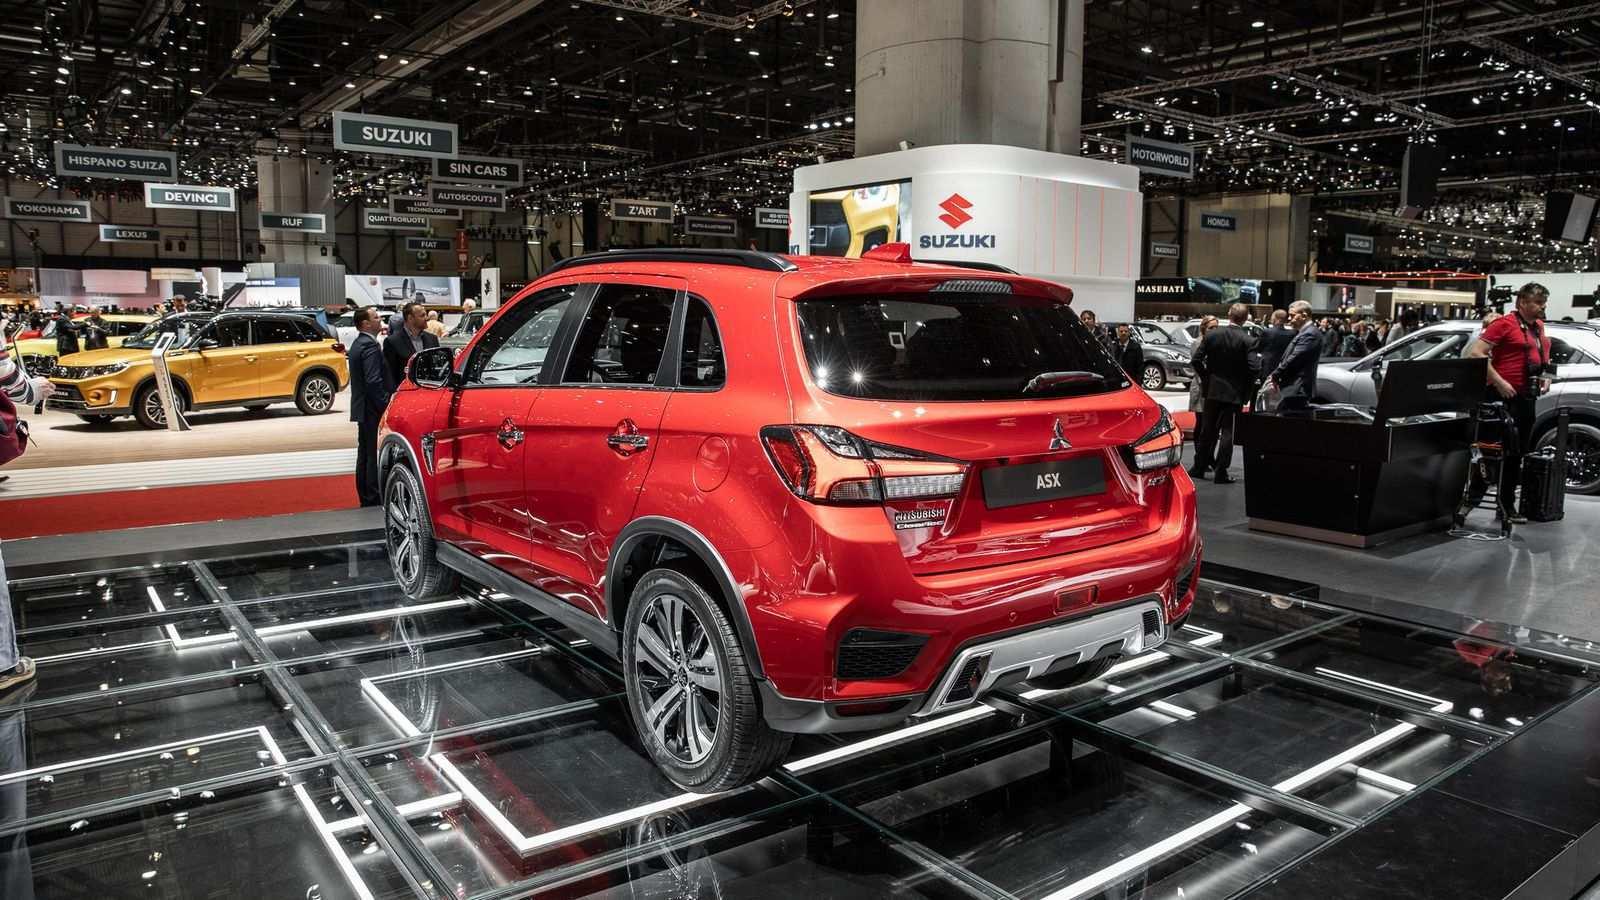 64 Gallery of Mitsubishi Motors 2020 Release Date by Mitsubishi Motors 2020